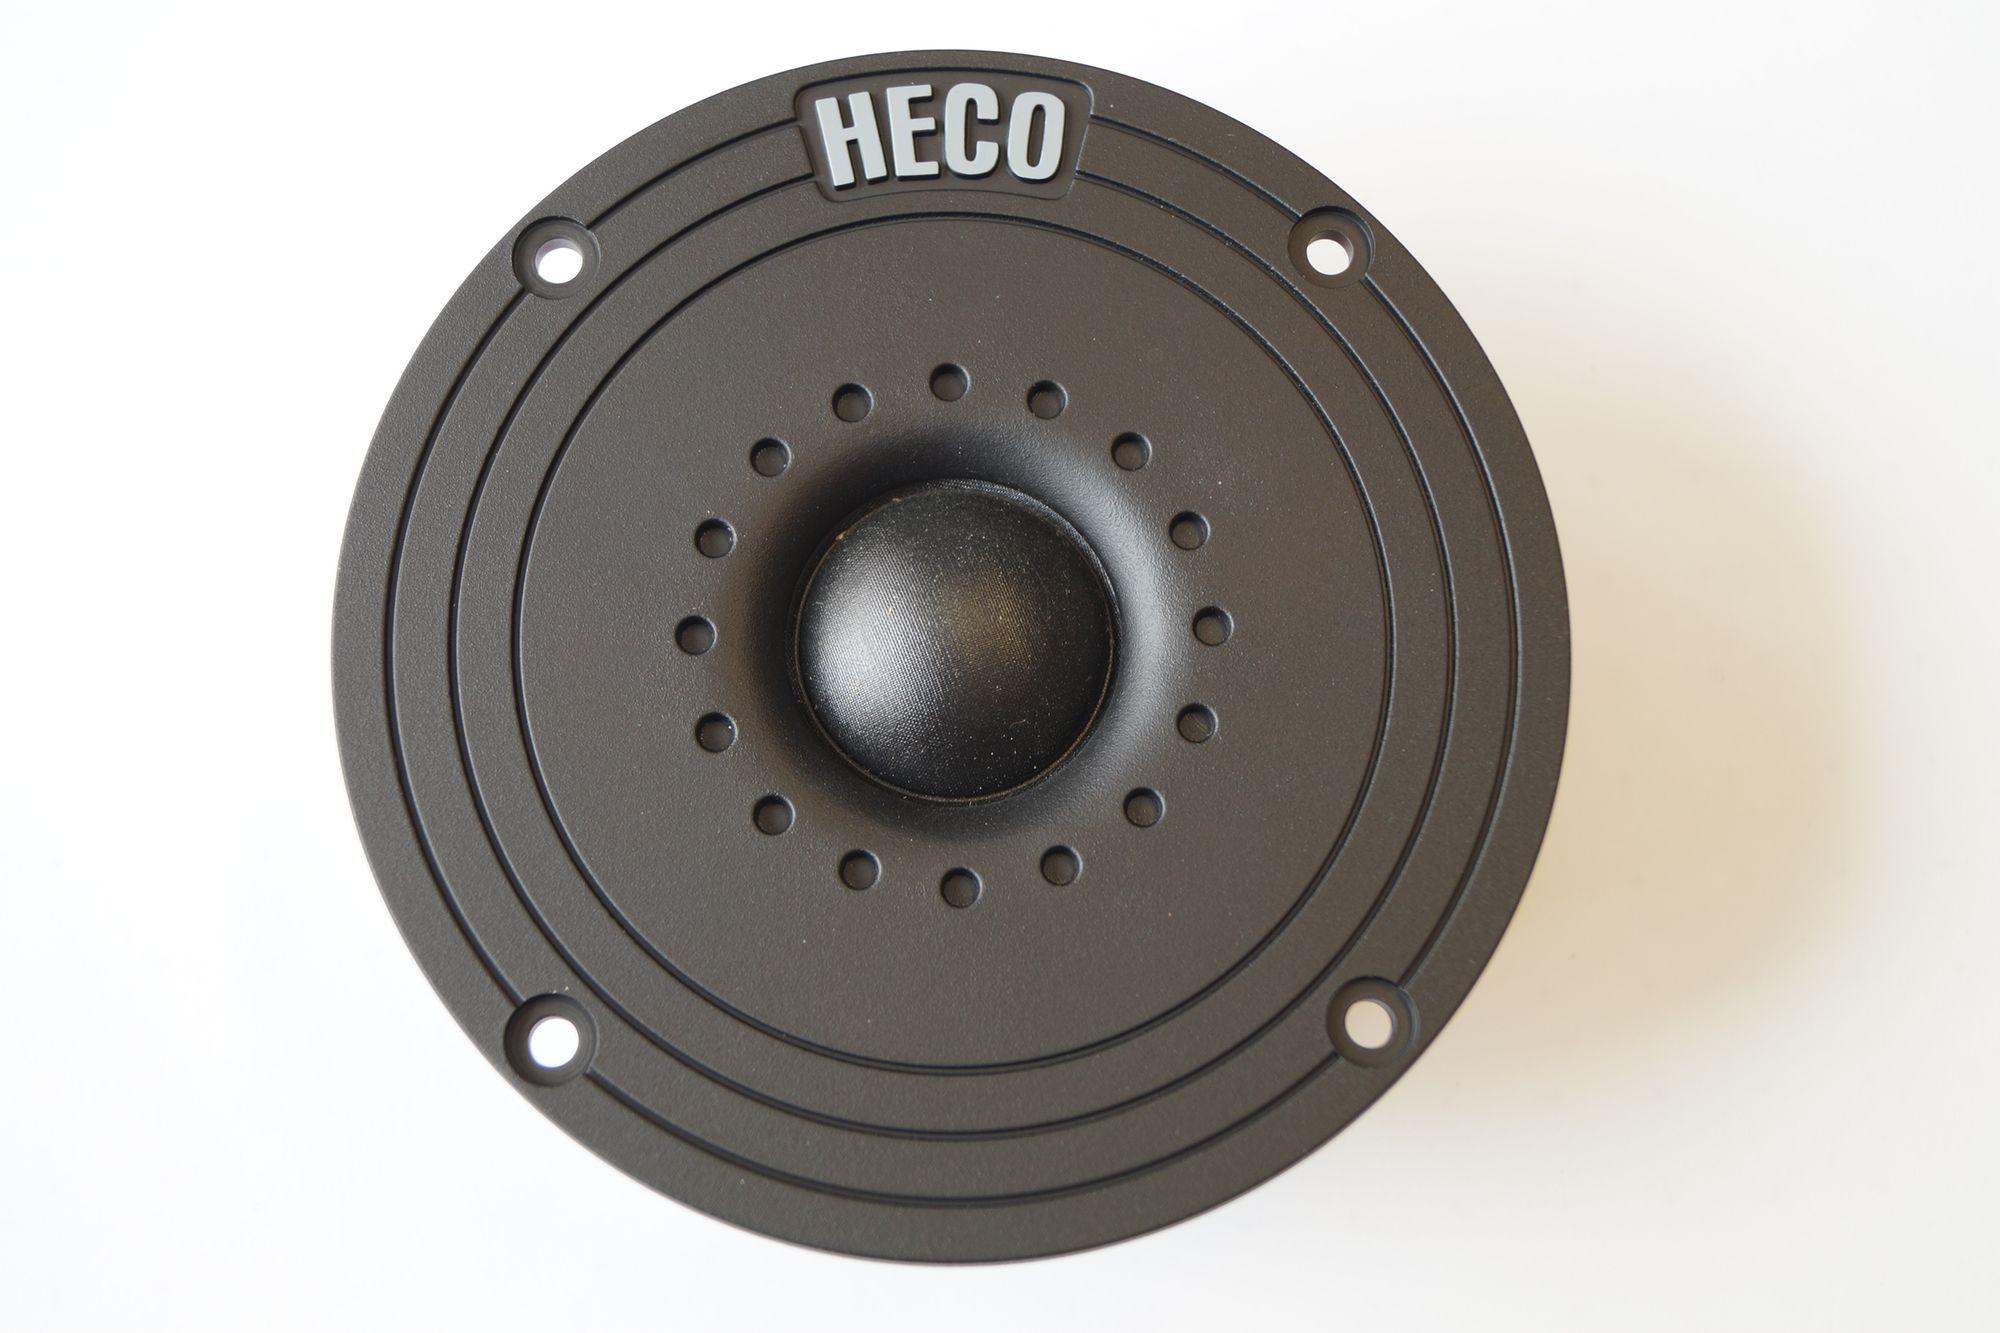 1 Paar 25 mm Gewebe Hochton-Kalotte Heco HT25K-GE670 S 75 Watt max., Serviceware